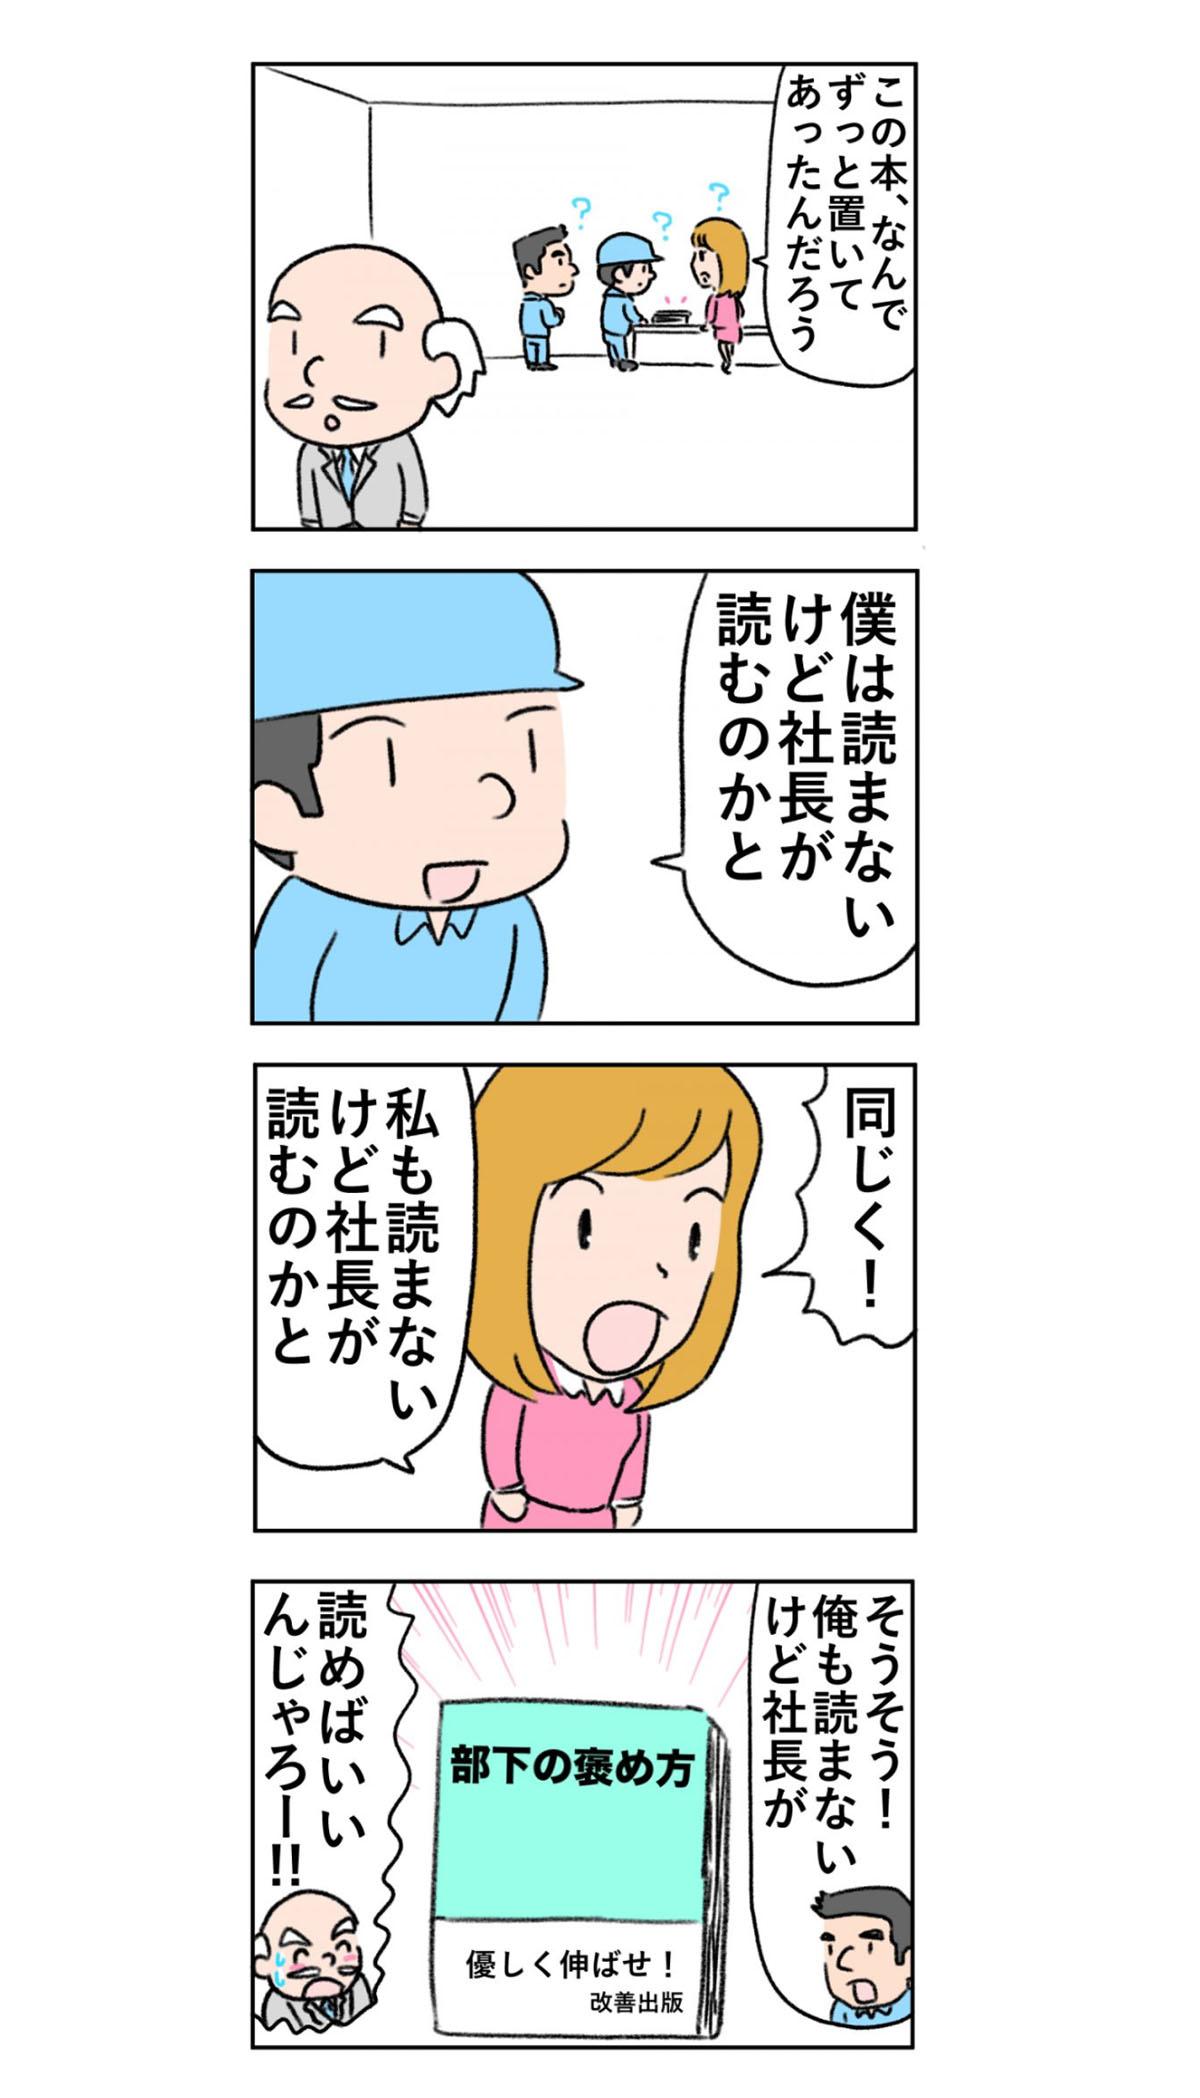 screencapture-kakiuchikaizen-archives-215-1490835441262のコピー